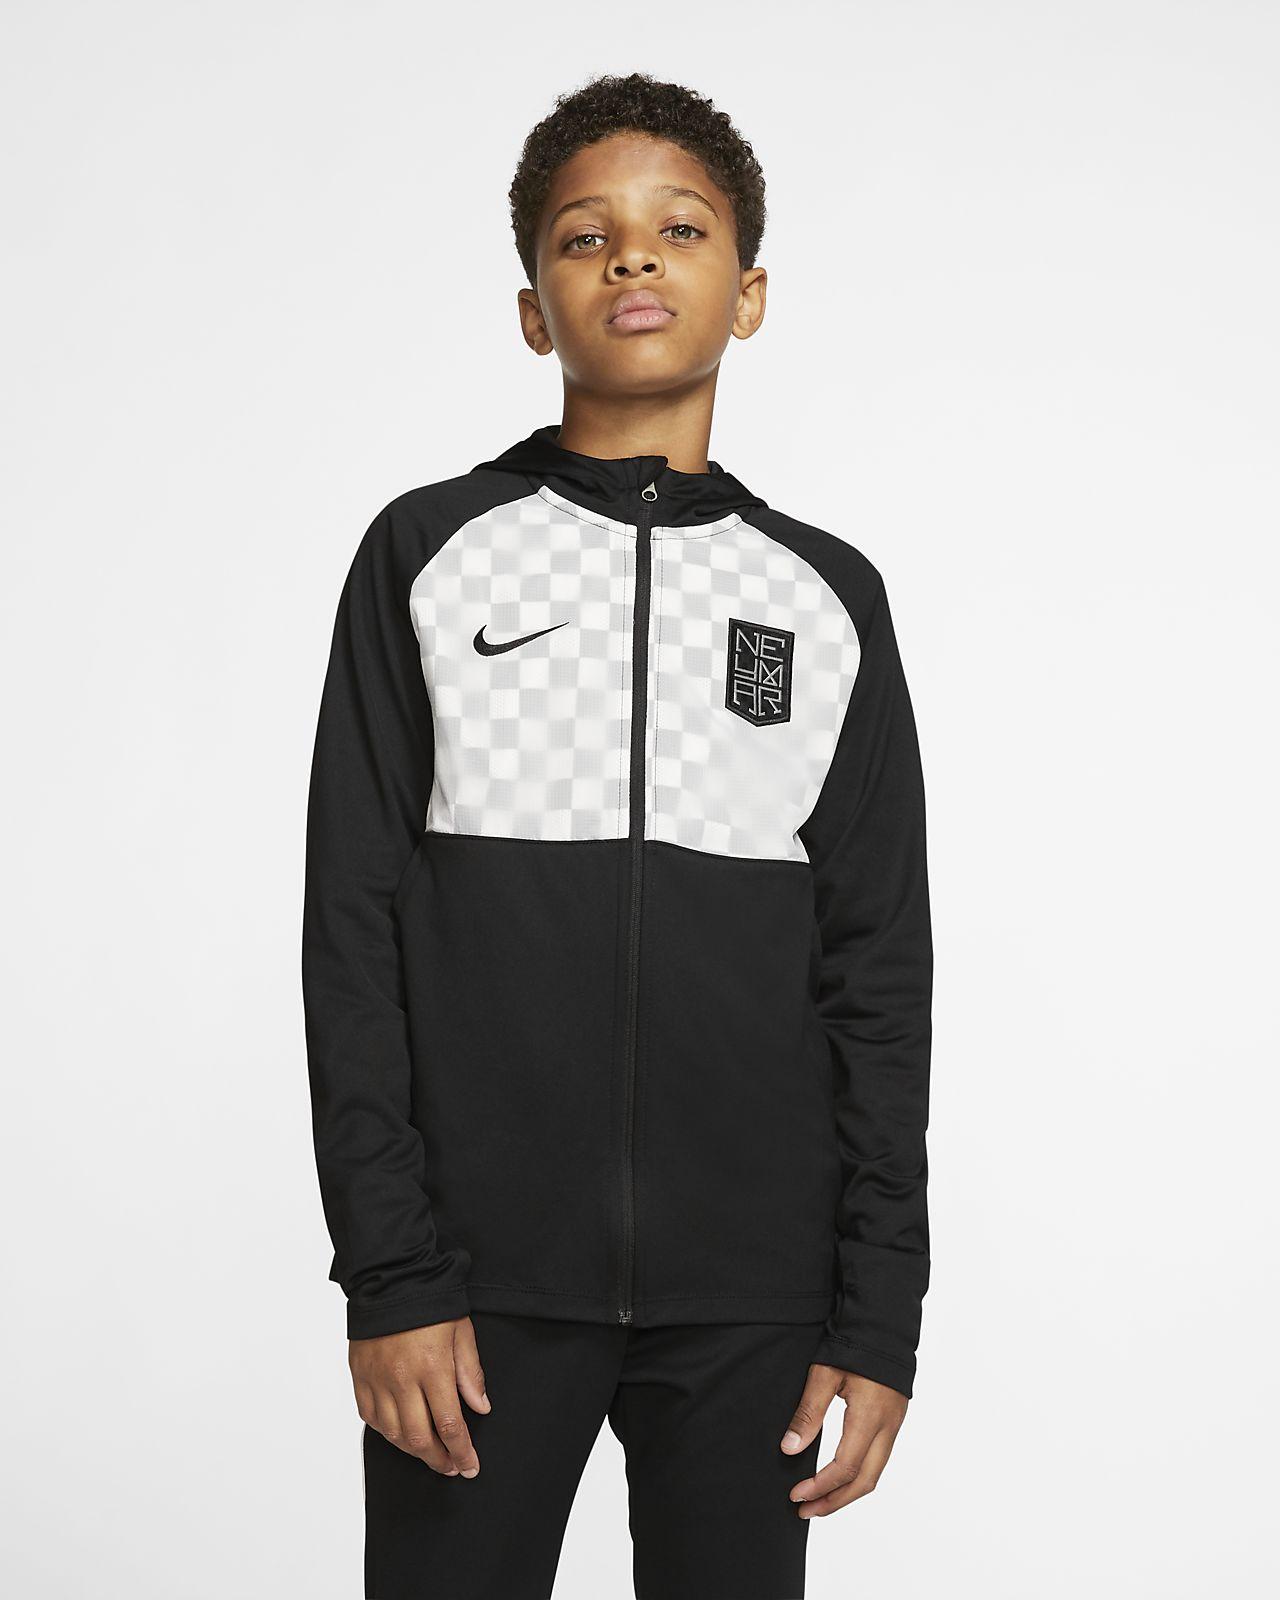 Nike Dri-FIT Neymar Jr. Genç Çocuk Futbol Ceketi